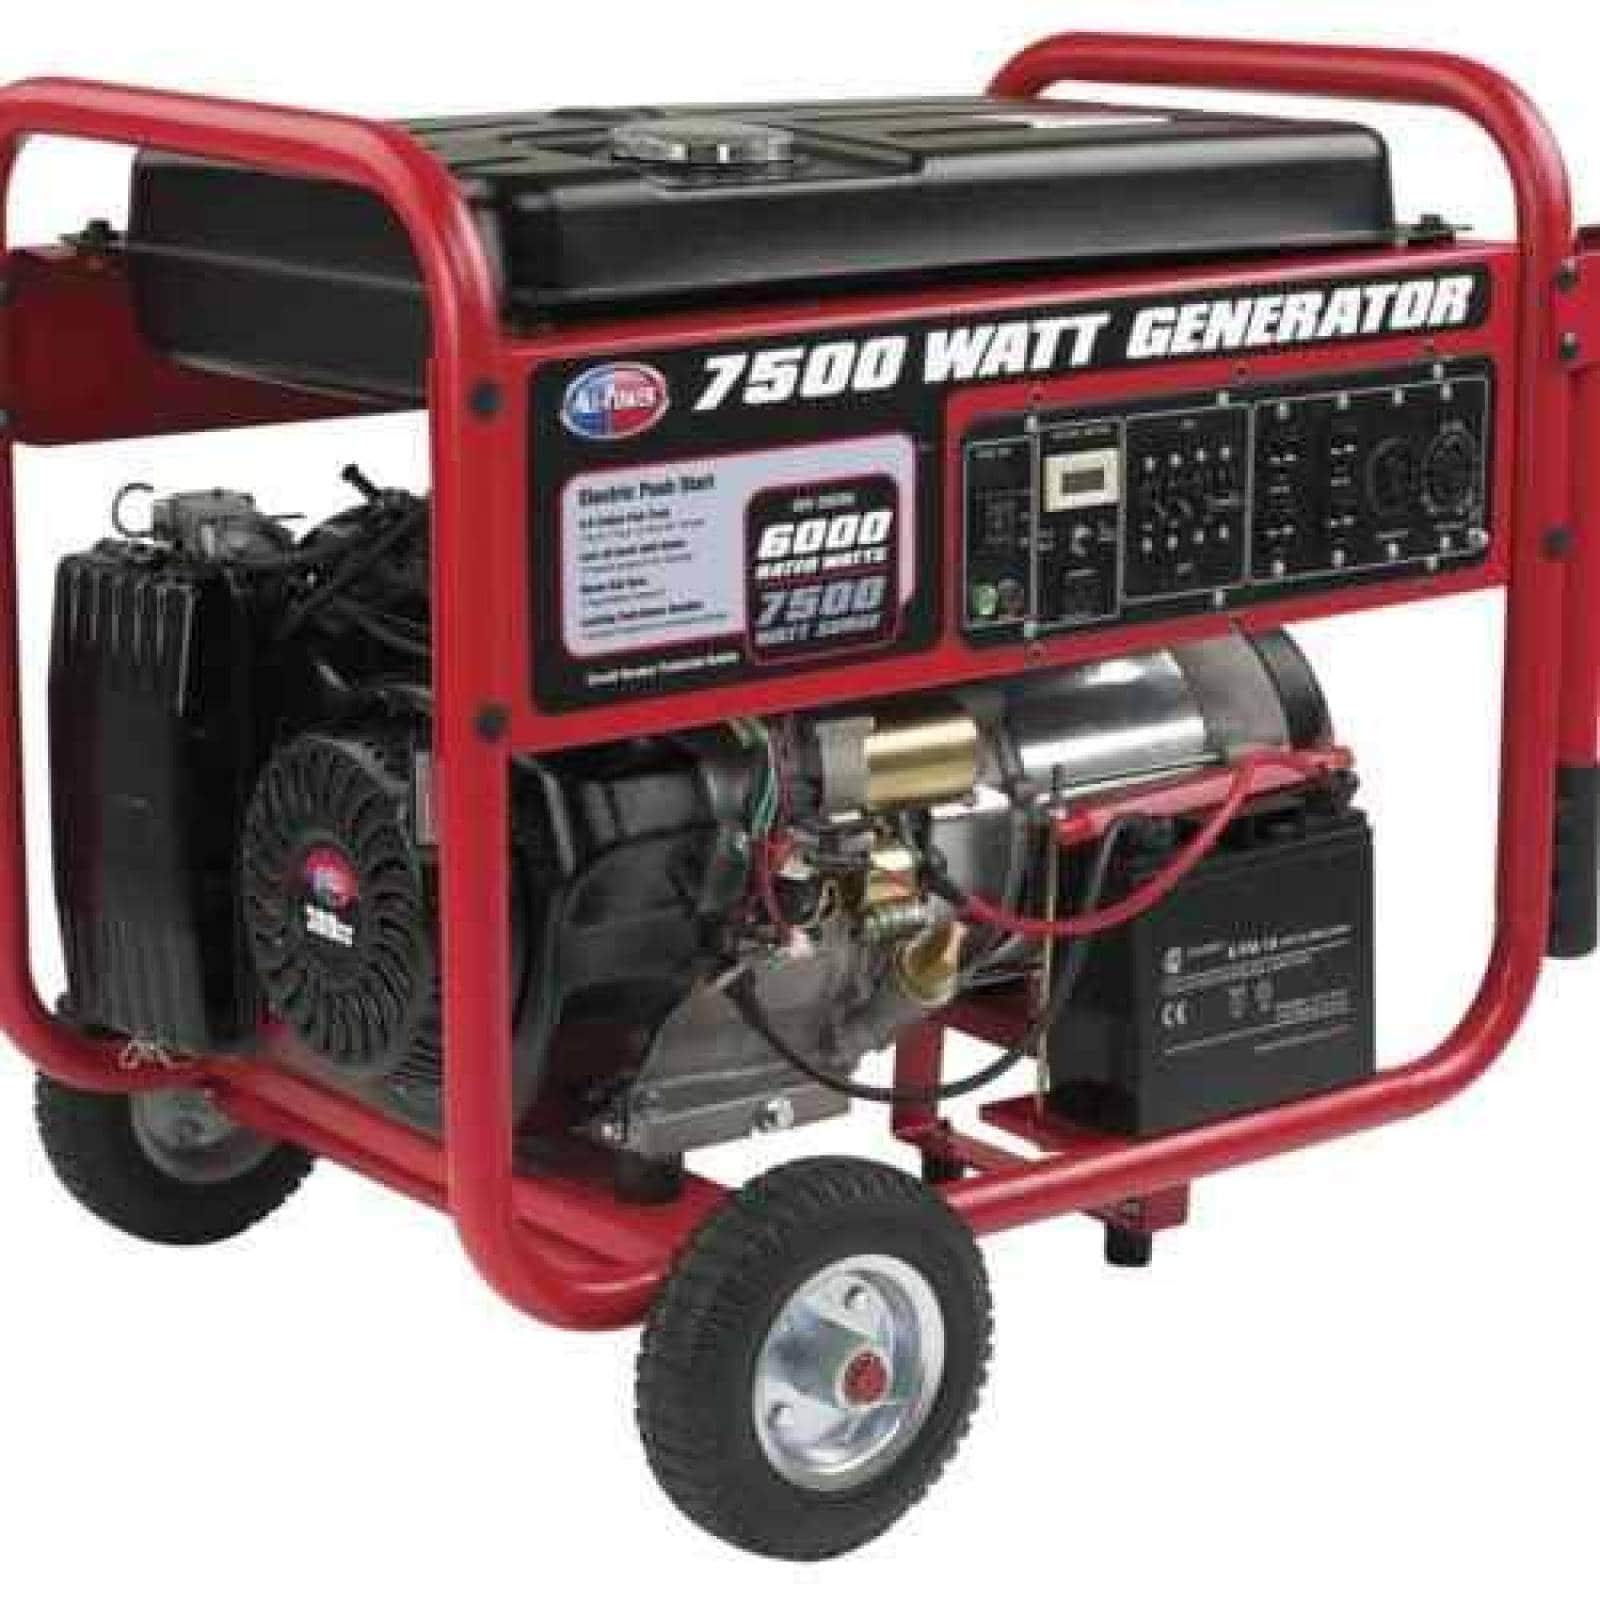 Generador Americano 7500W All Power Shimaha